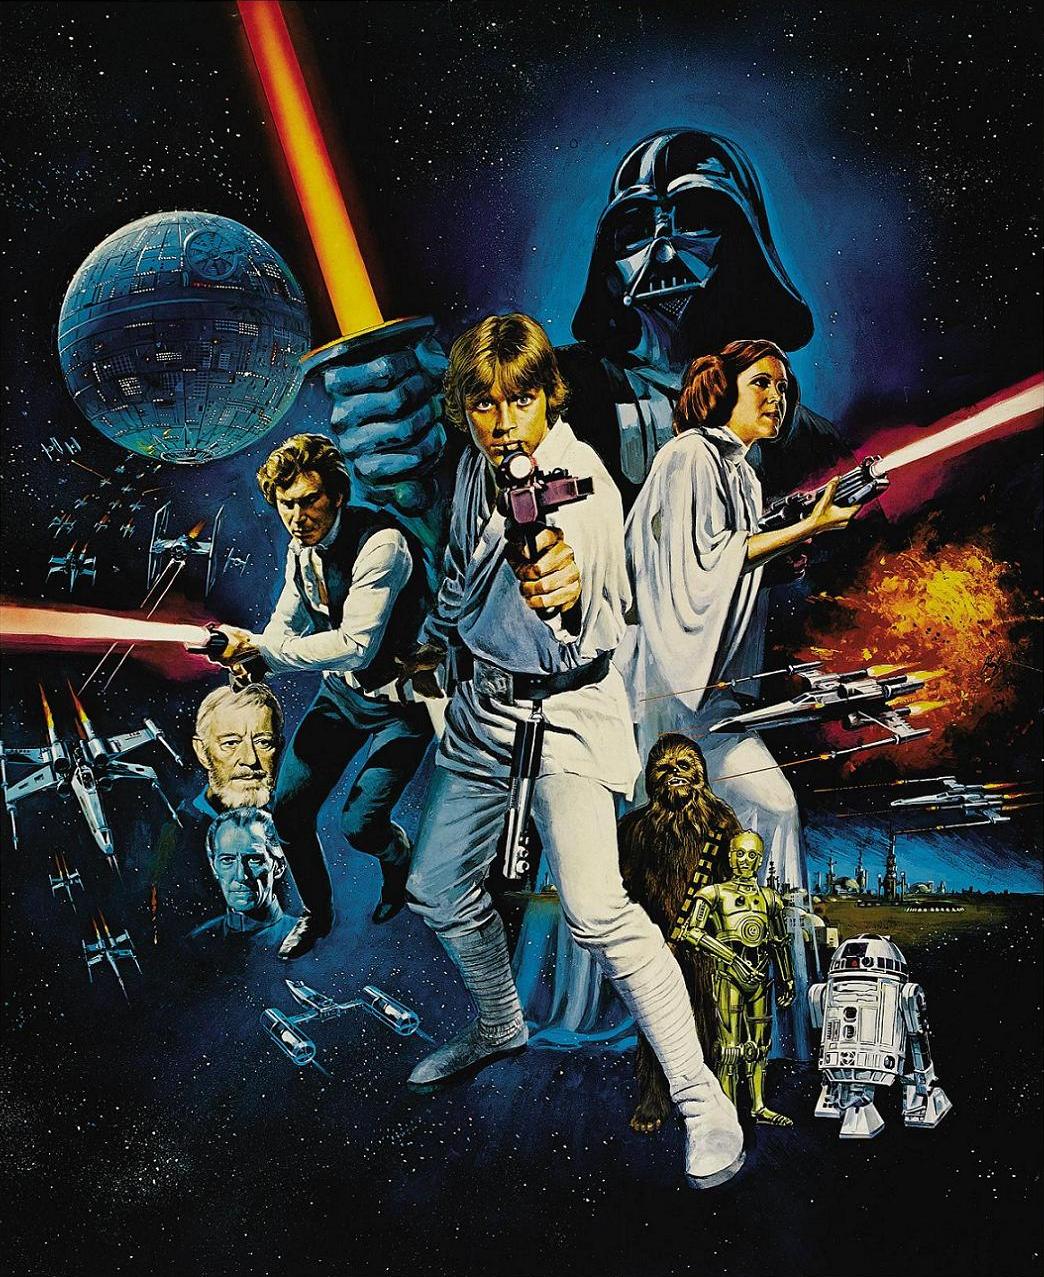 Star Wars Poster Wallpapers Wallpaper Cave